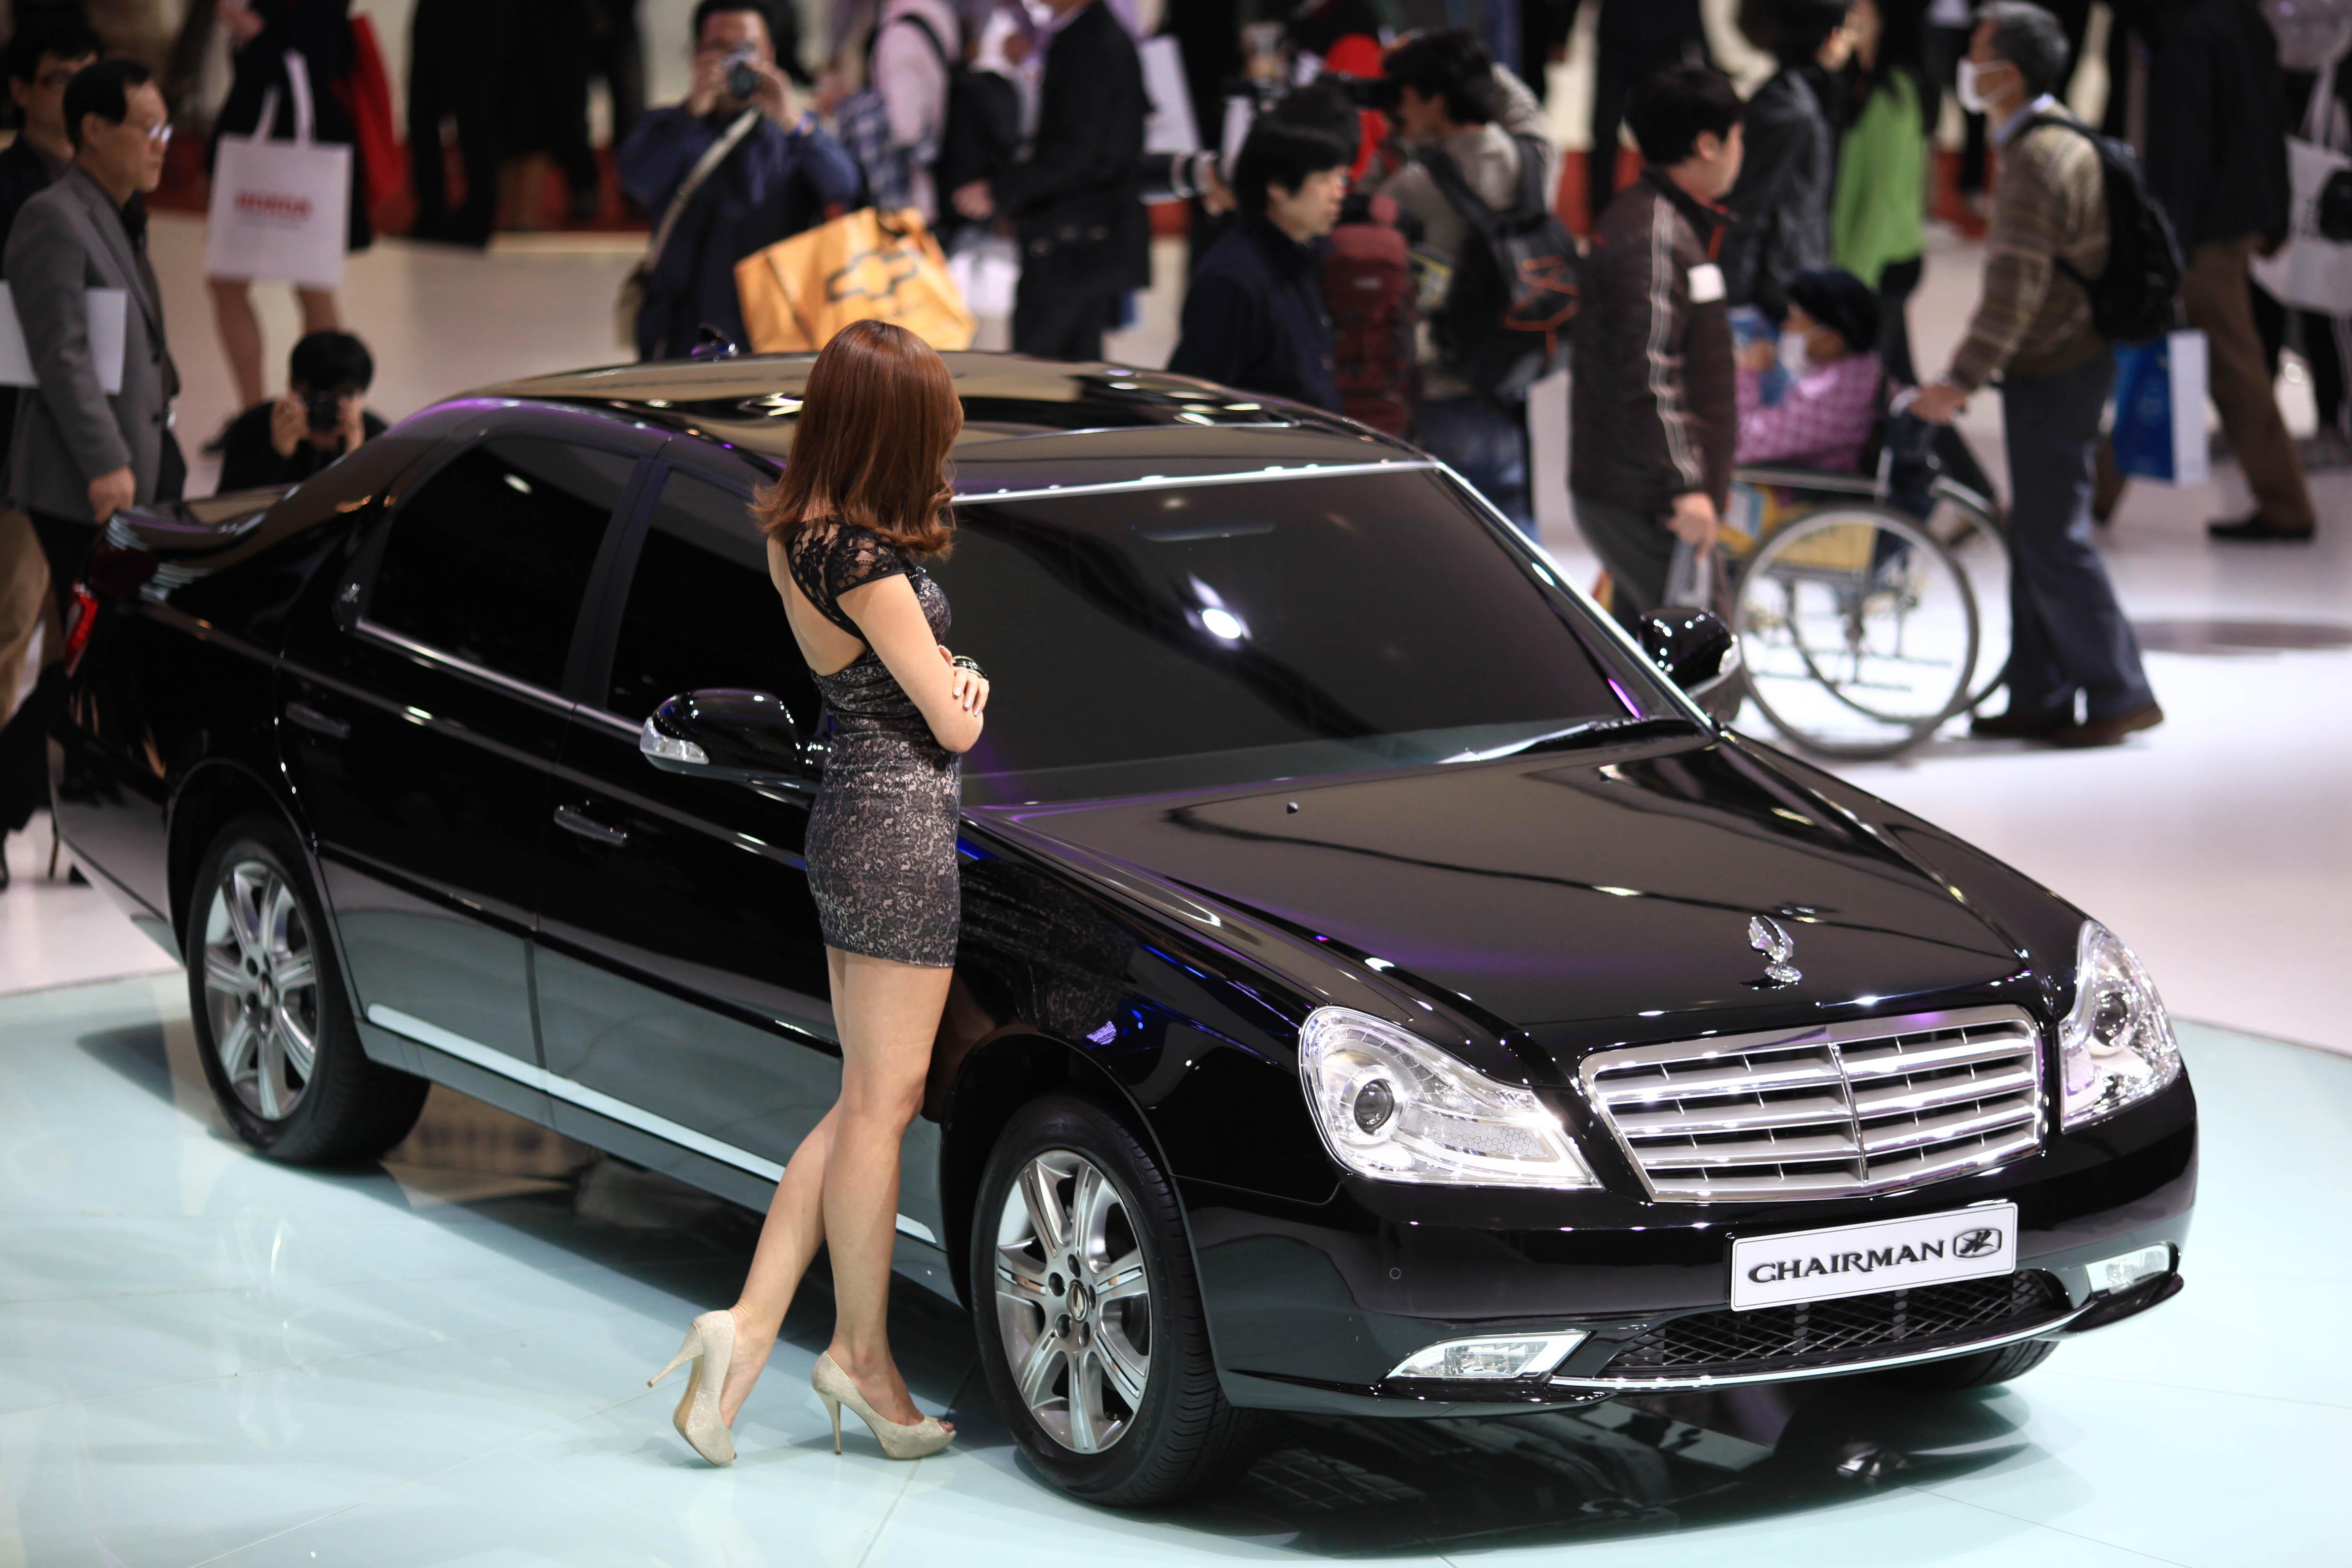 Daewoo Chairman Gen.1 :: 4 versions :: autoviva